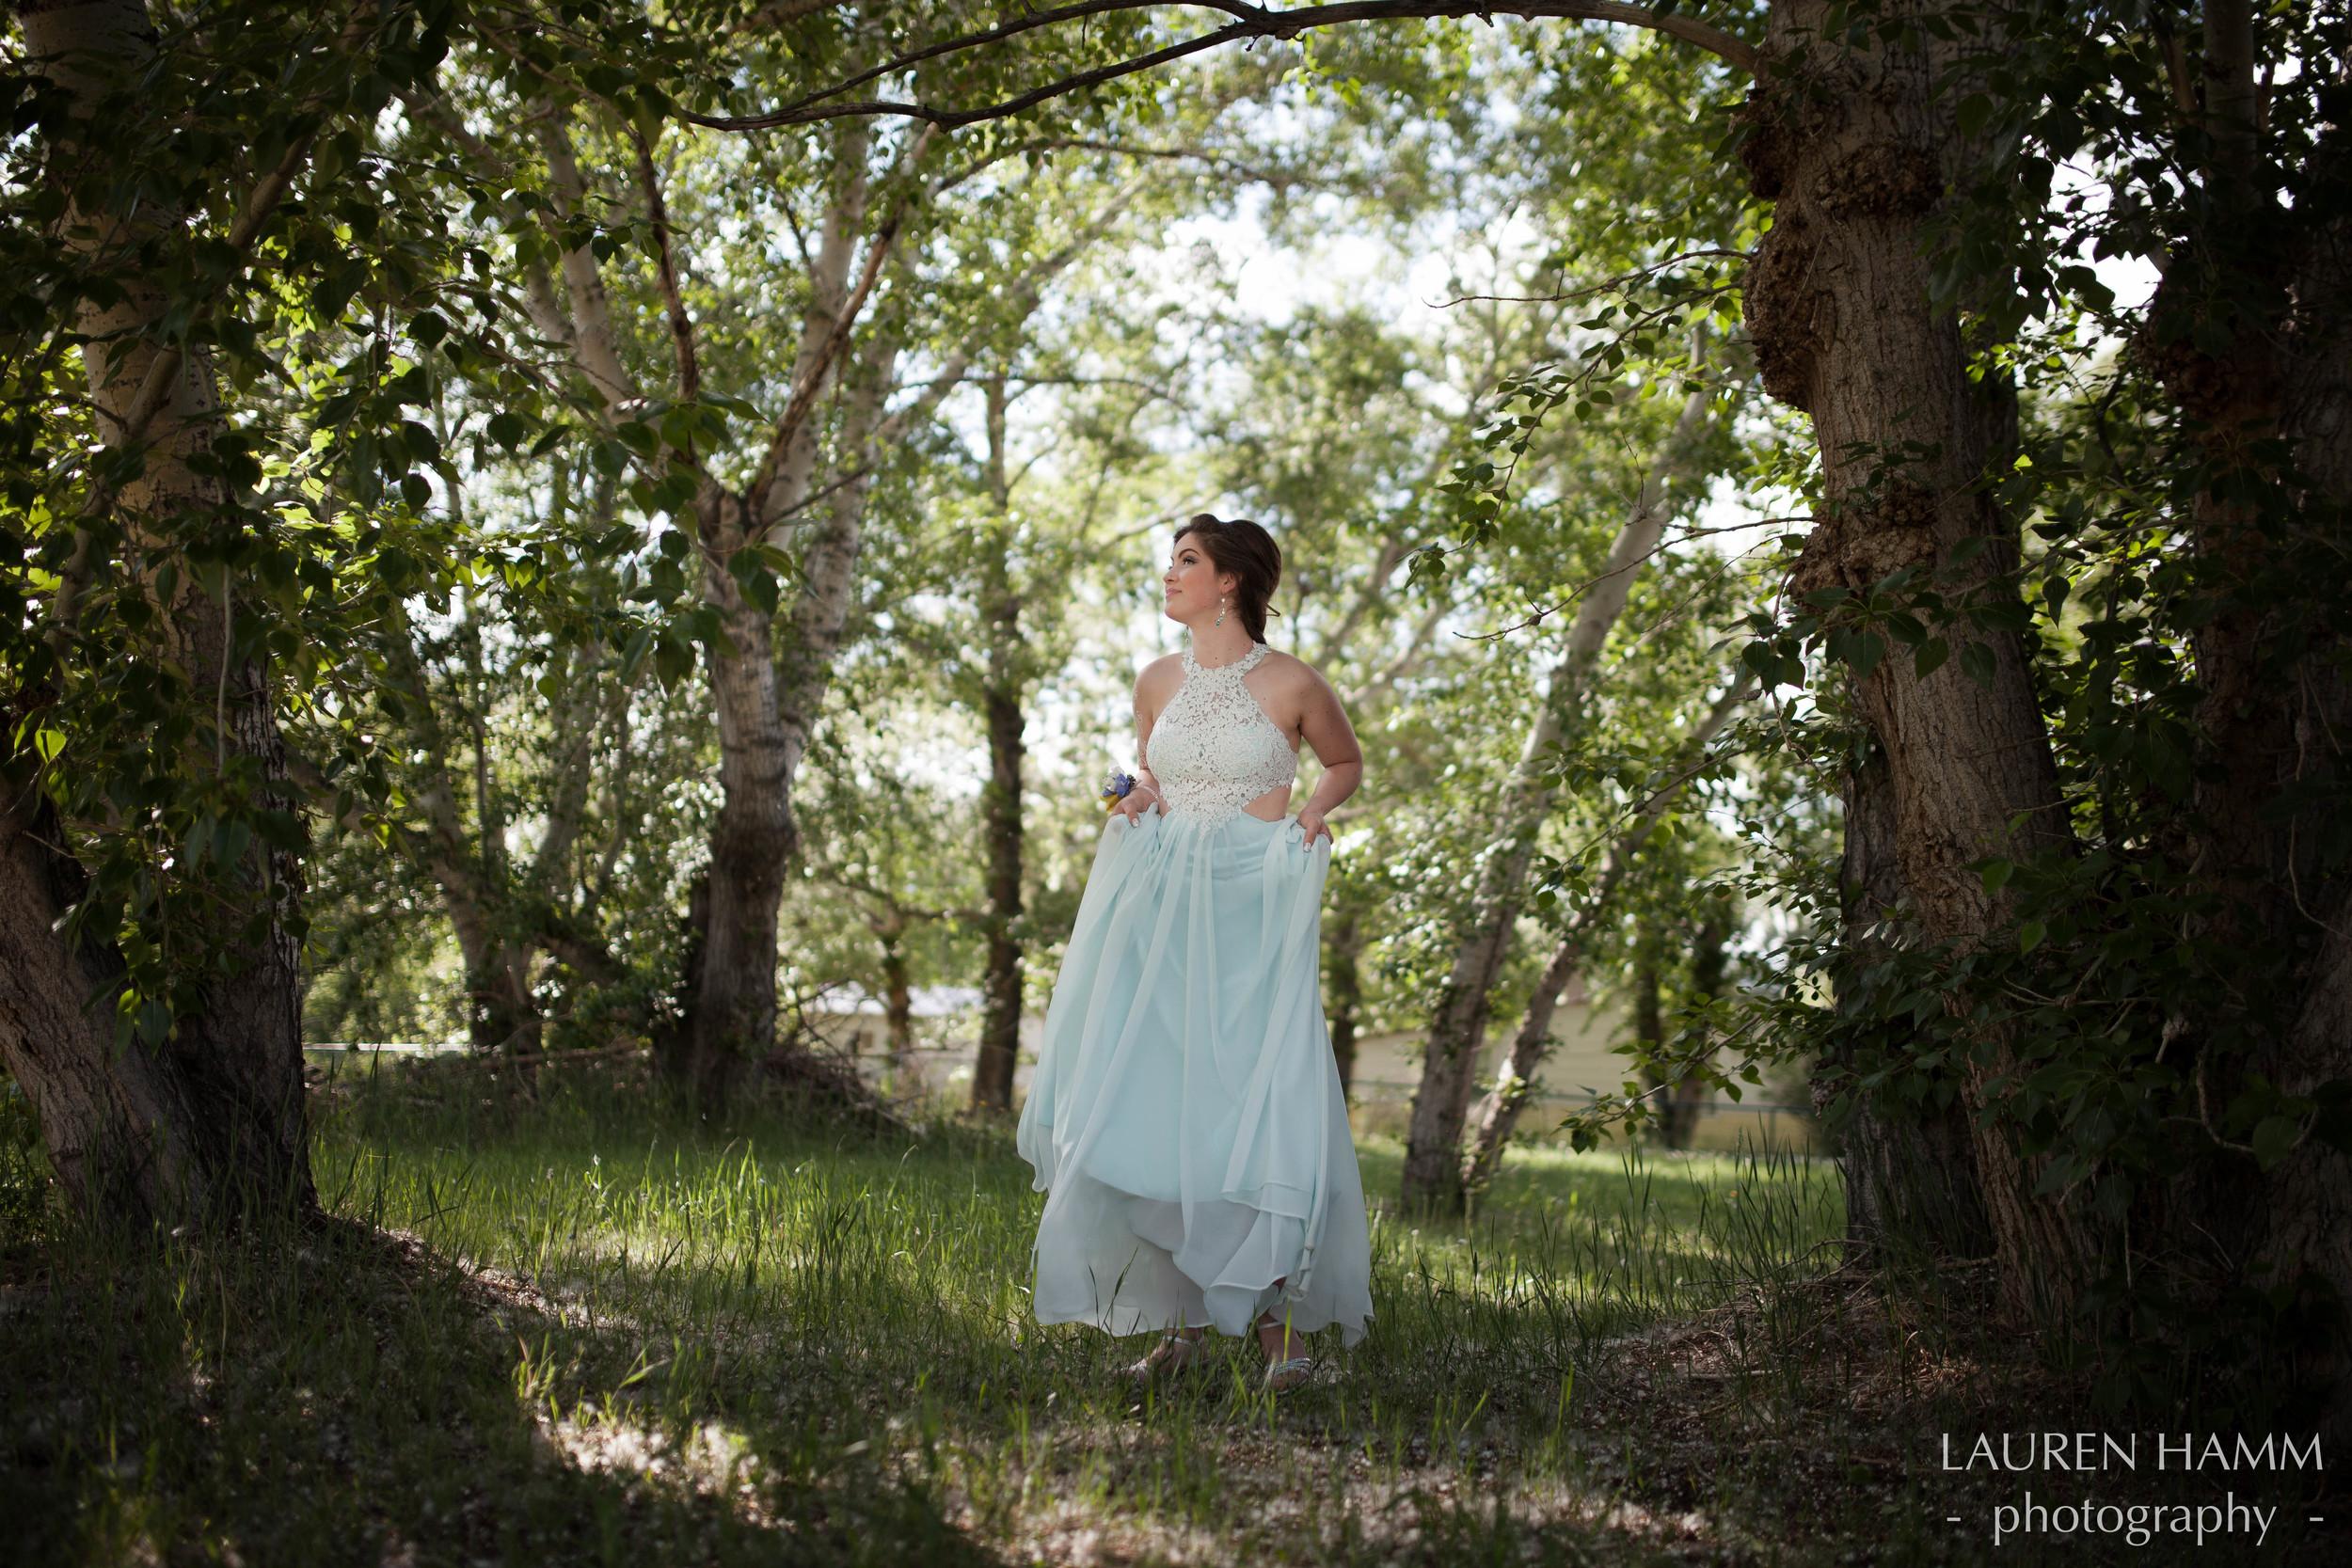 Karis Hilchey | Graduation | Lauren Hamm Photography